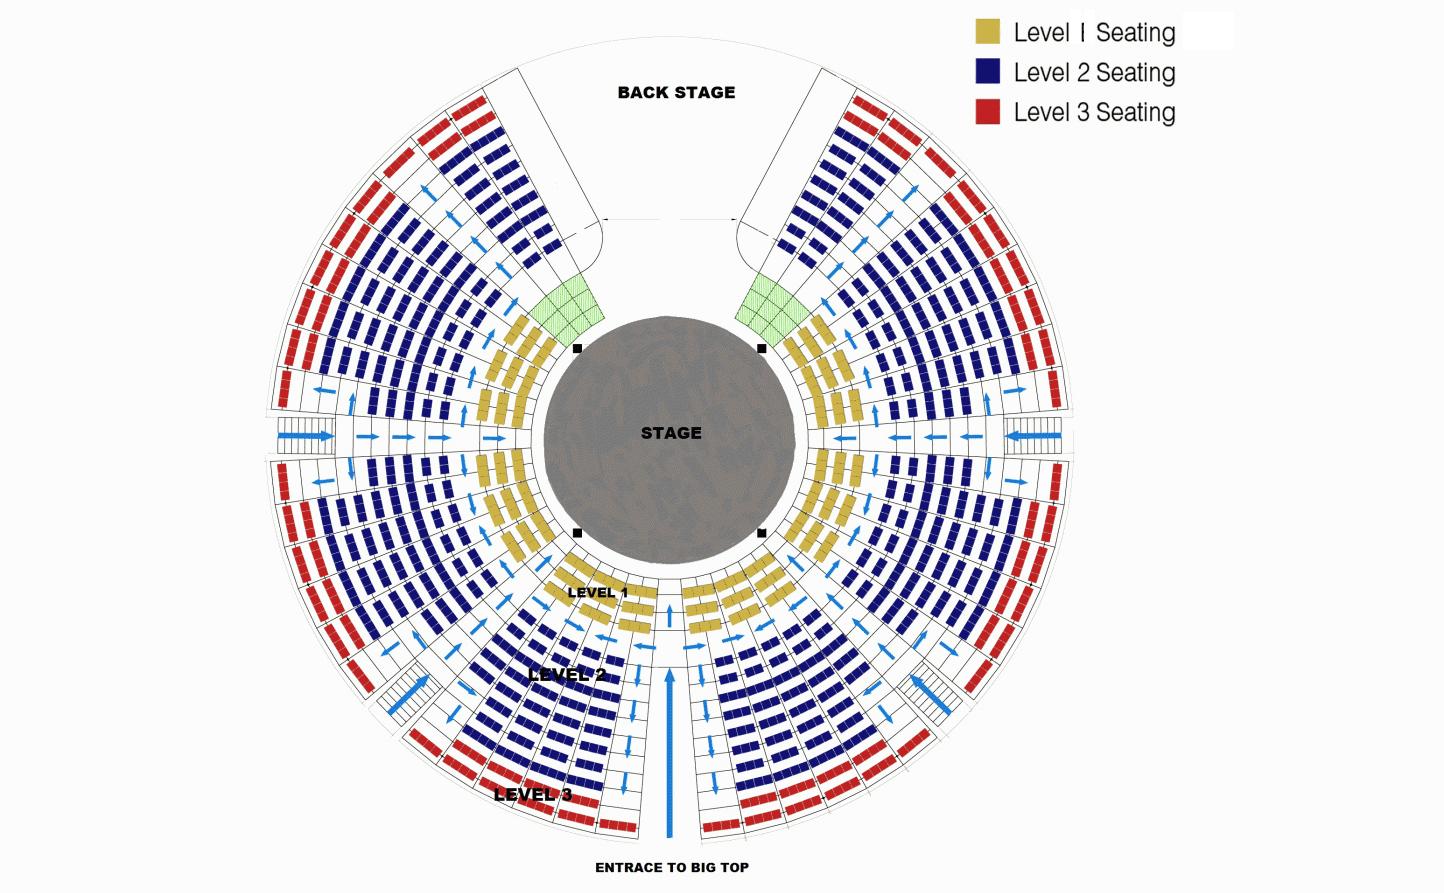 Big apple circus seating chart philadelphia elcho table